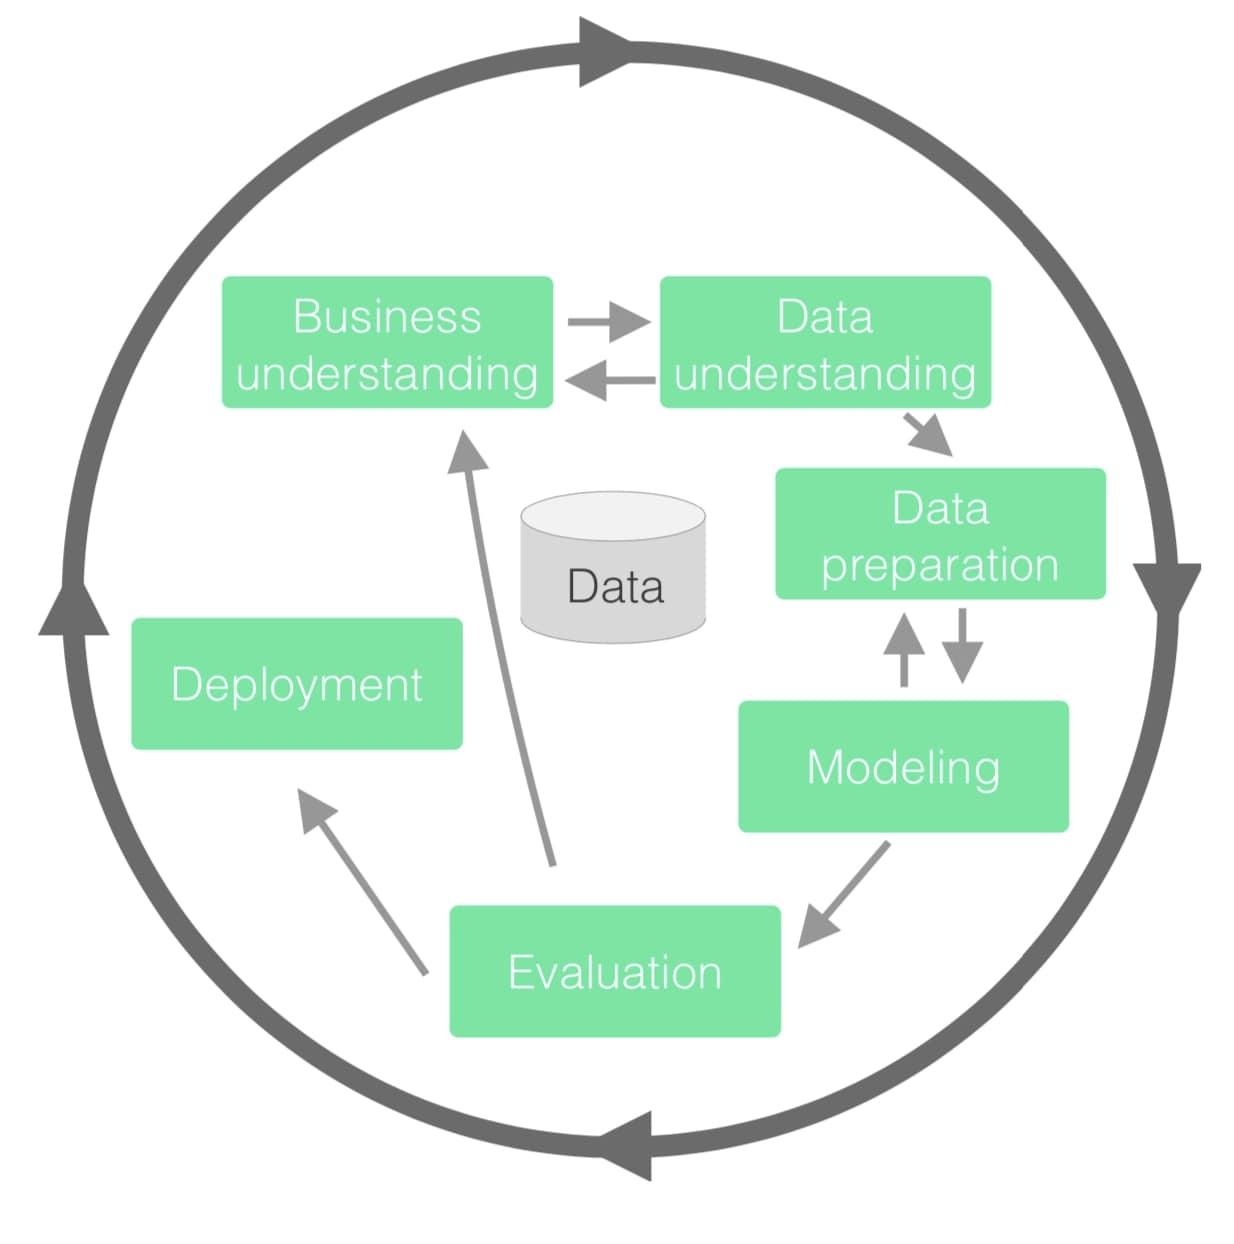 CRISP-DM: Cross-industry standard process for data mining.